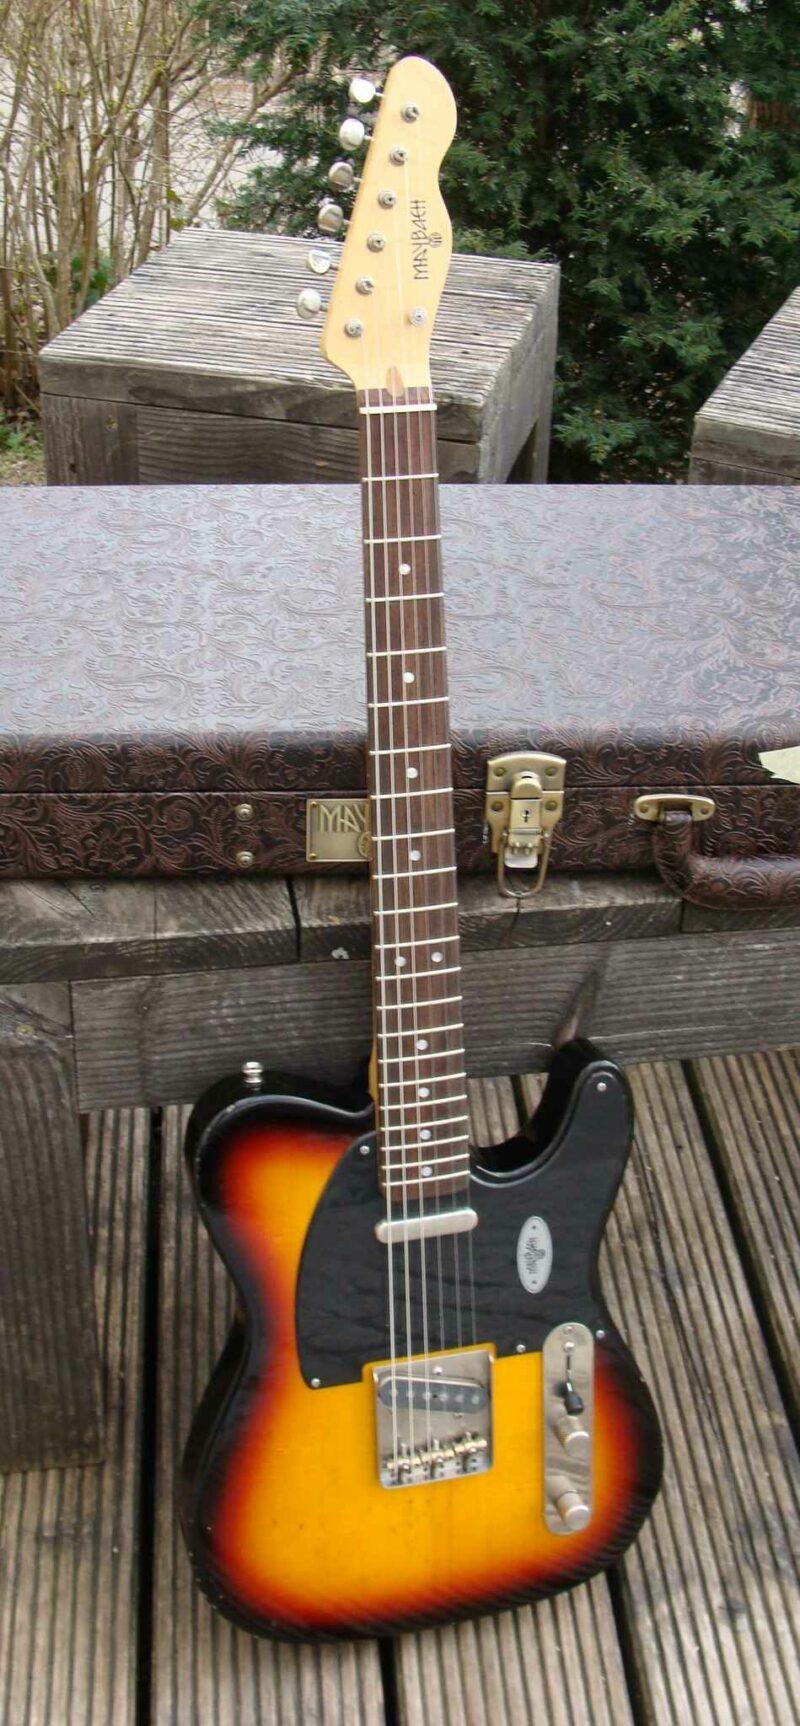 maybach teleman t61 3 tone sb aged 5 ohguitar